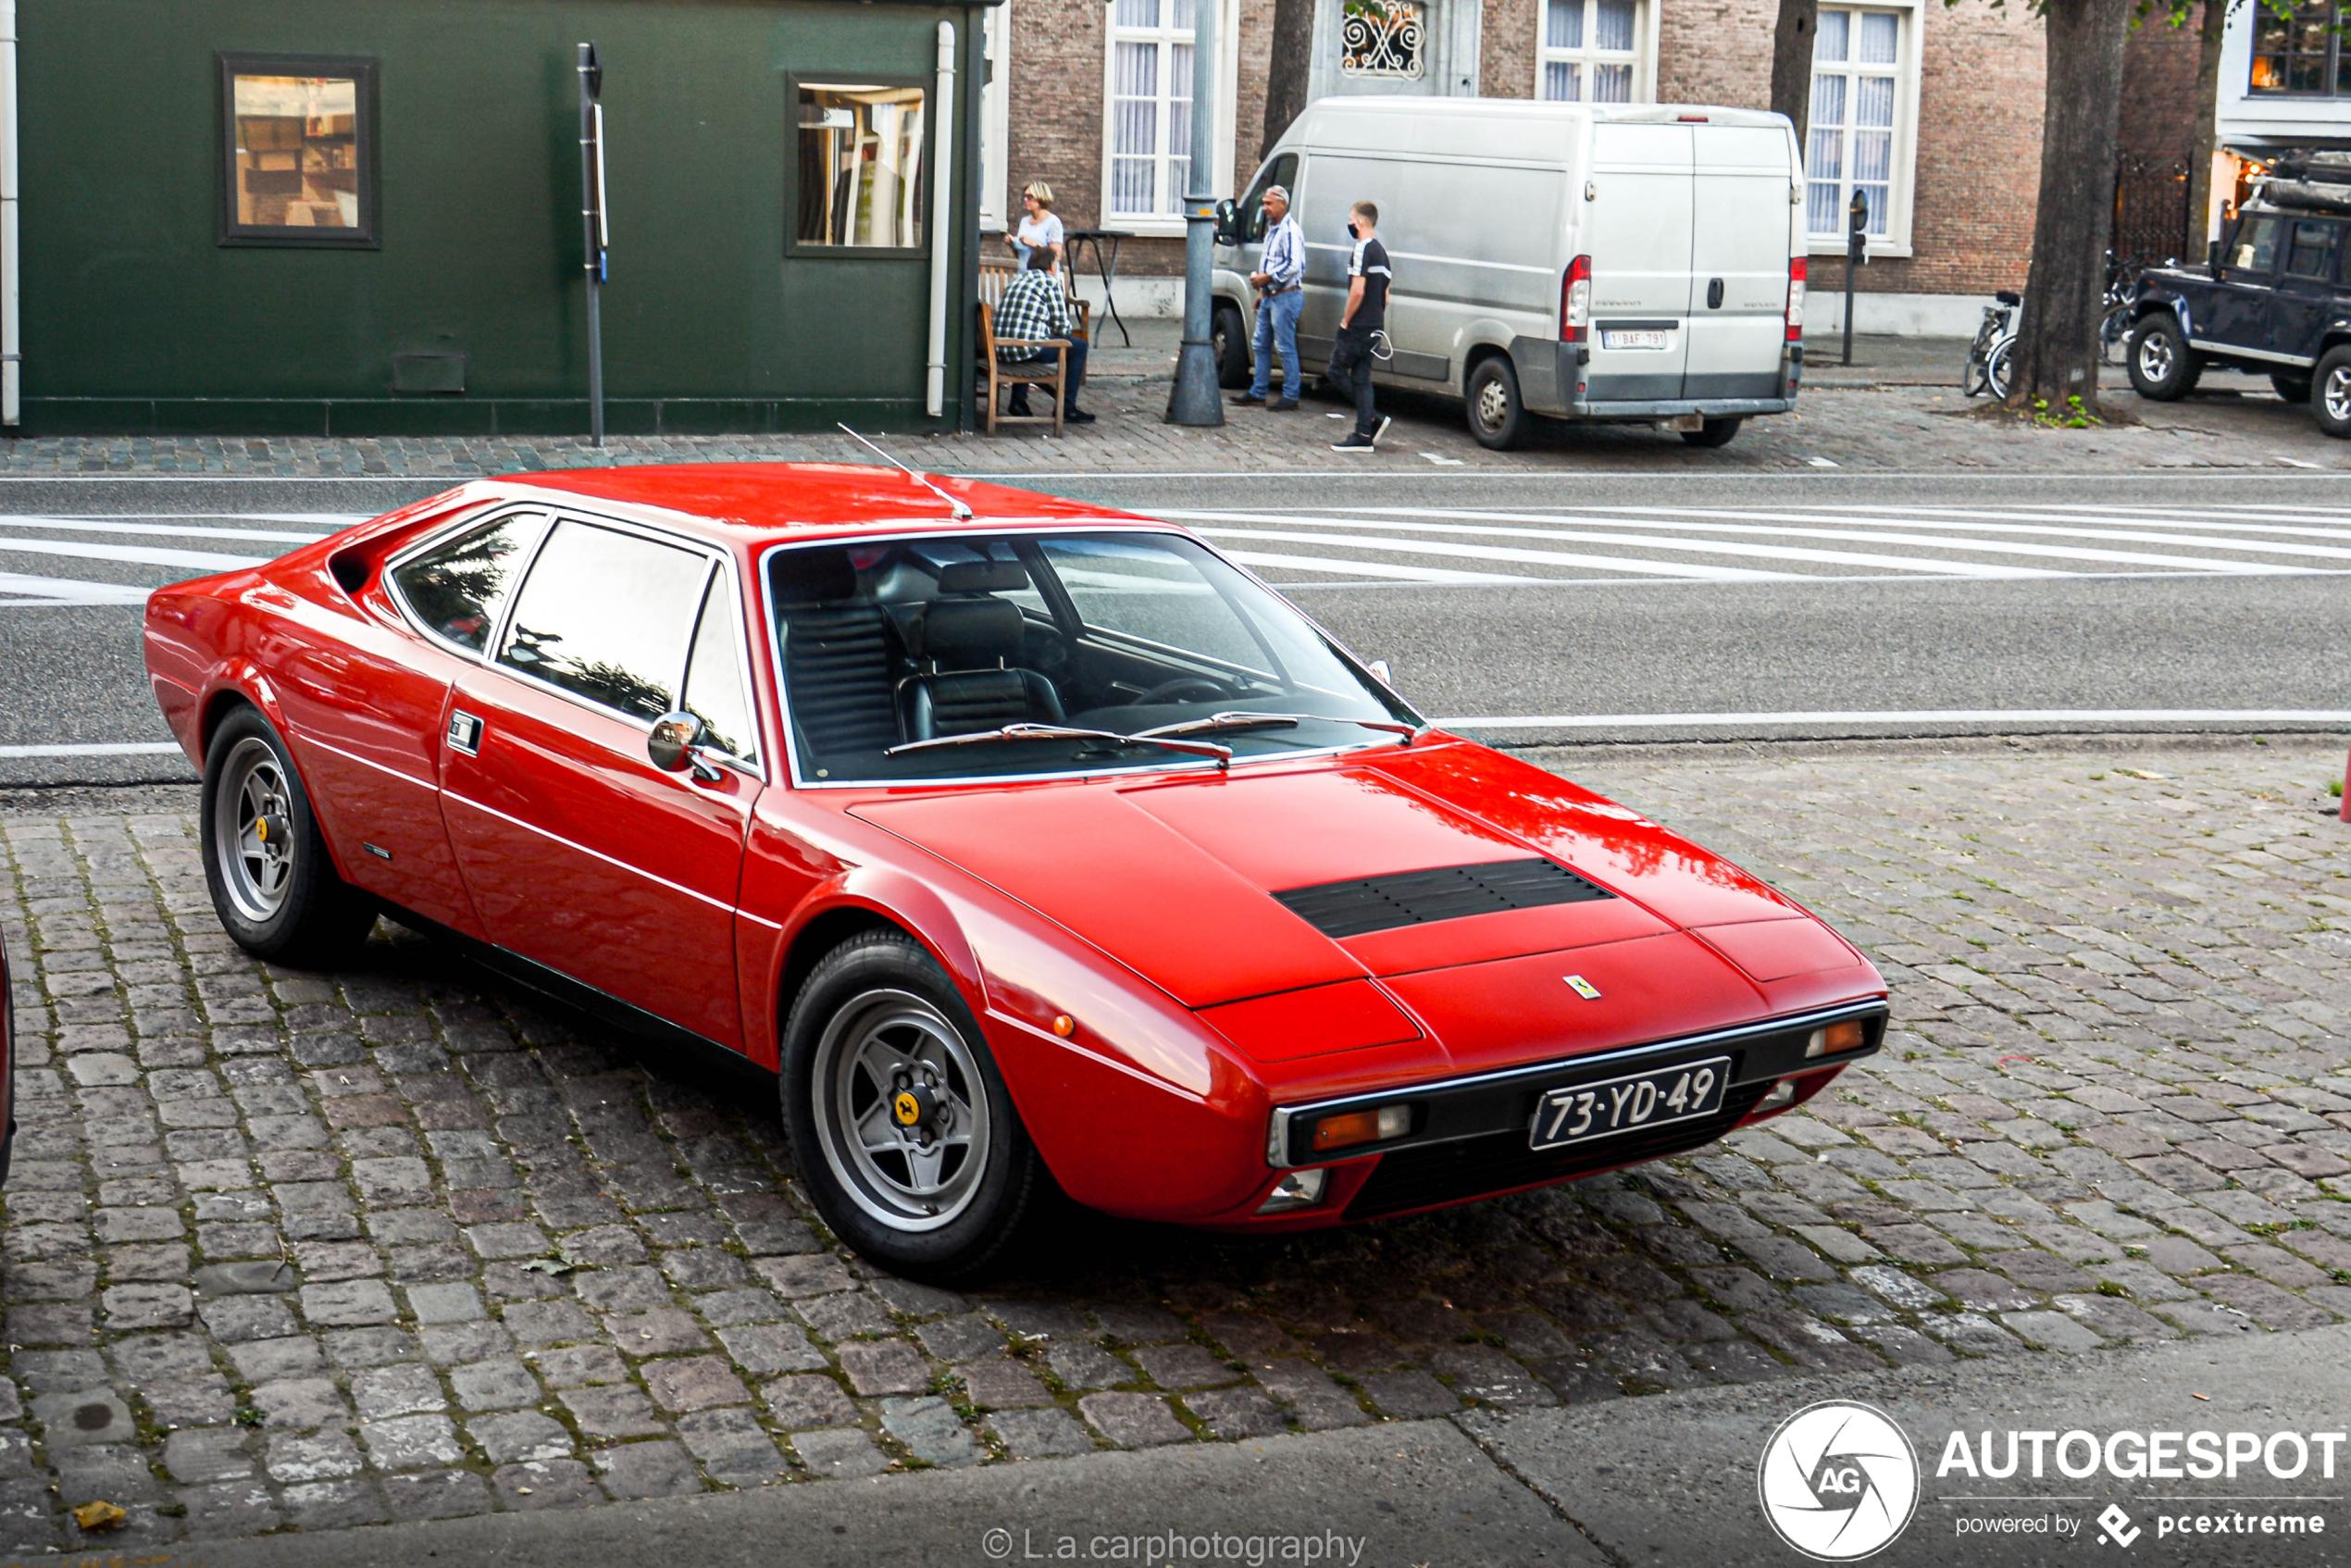 FerrariDino 308 GT4